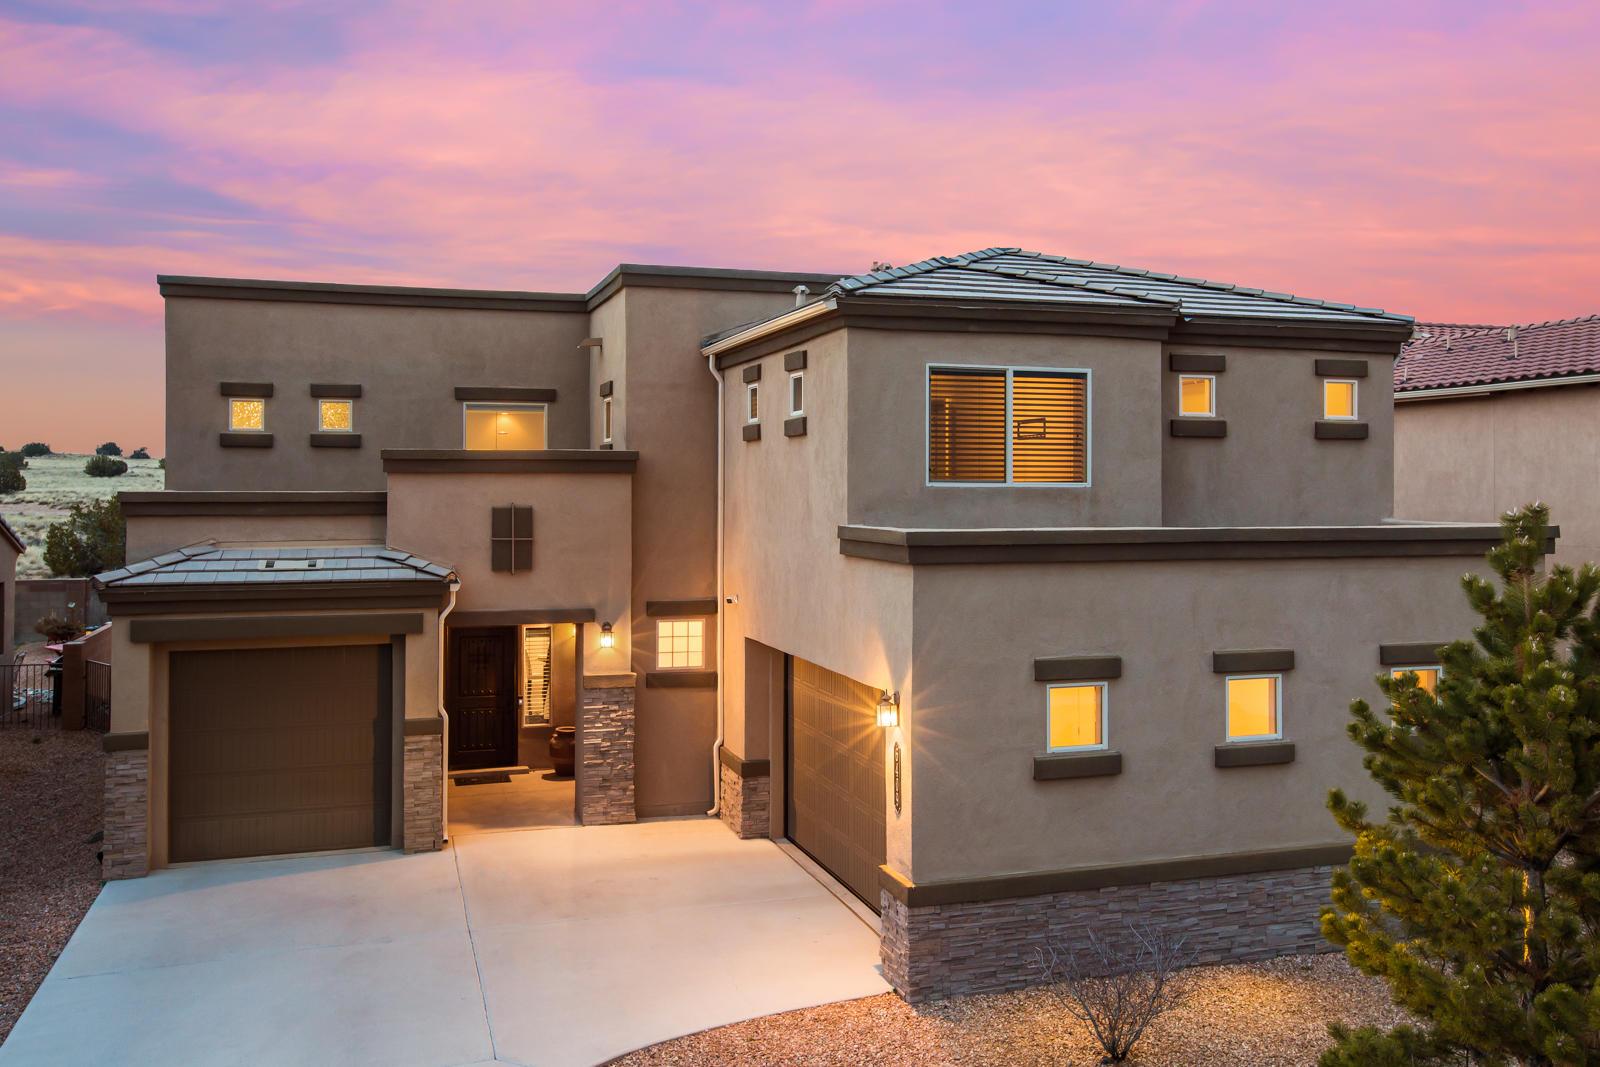 6409 NW Aloe Road, Northwest Albuquerque and Northwest Heights, New Mexico